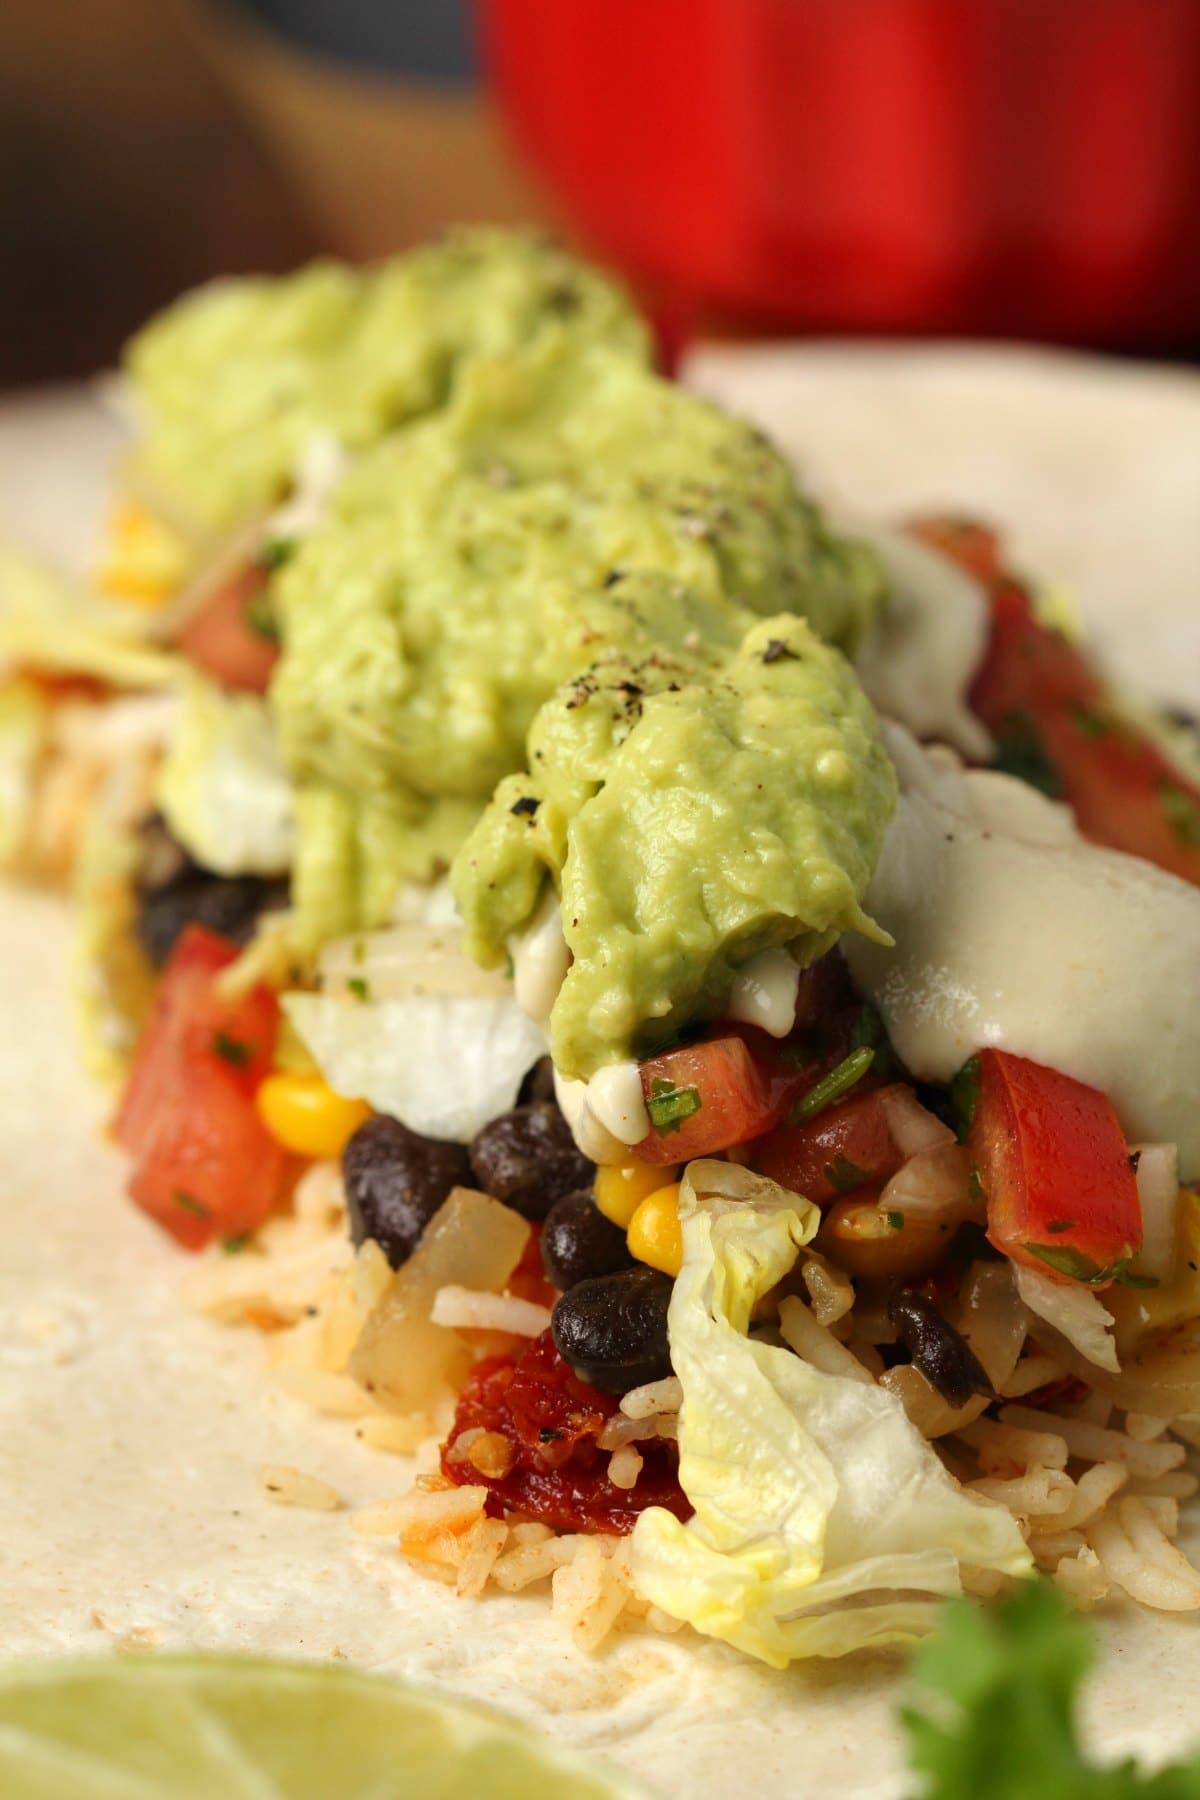 Assembling a vegan burrito.